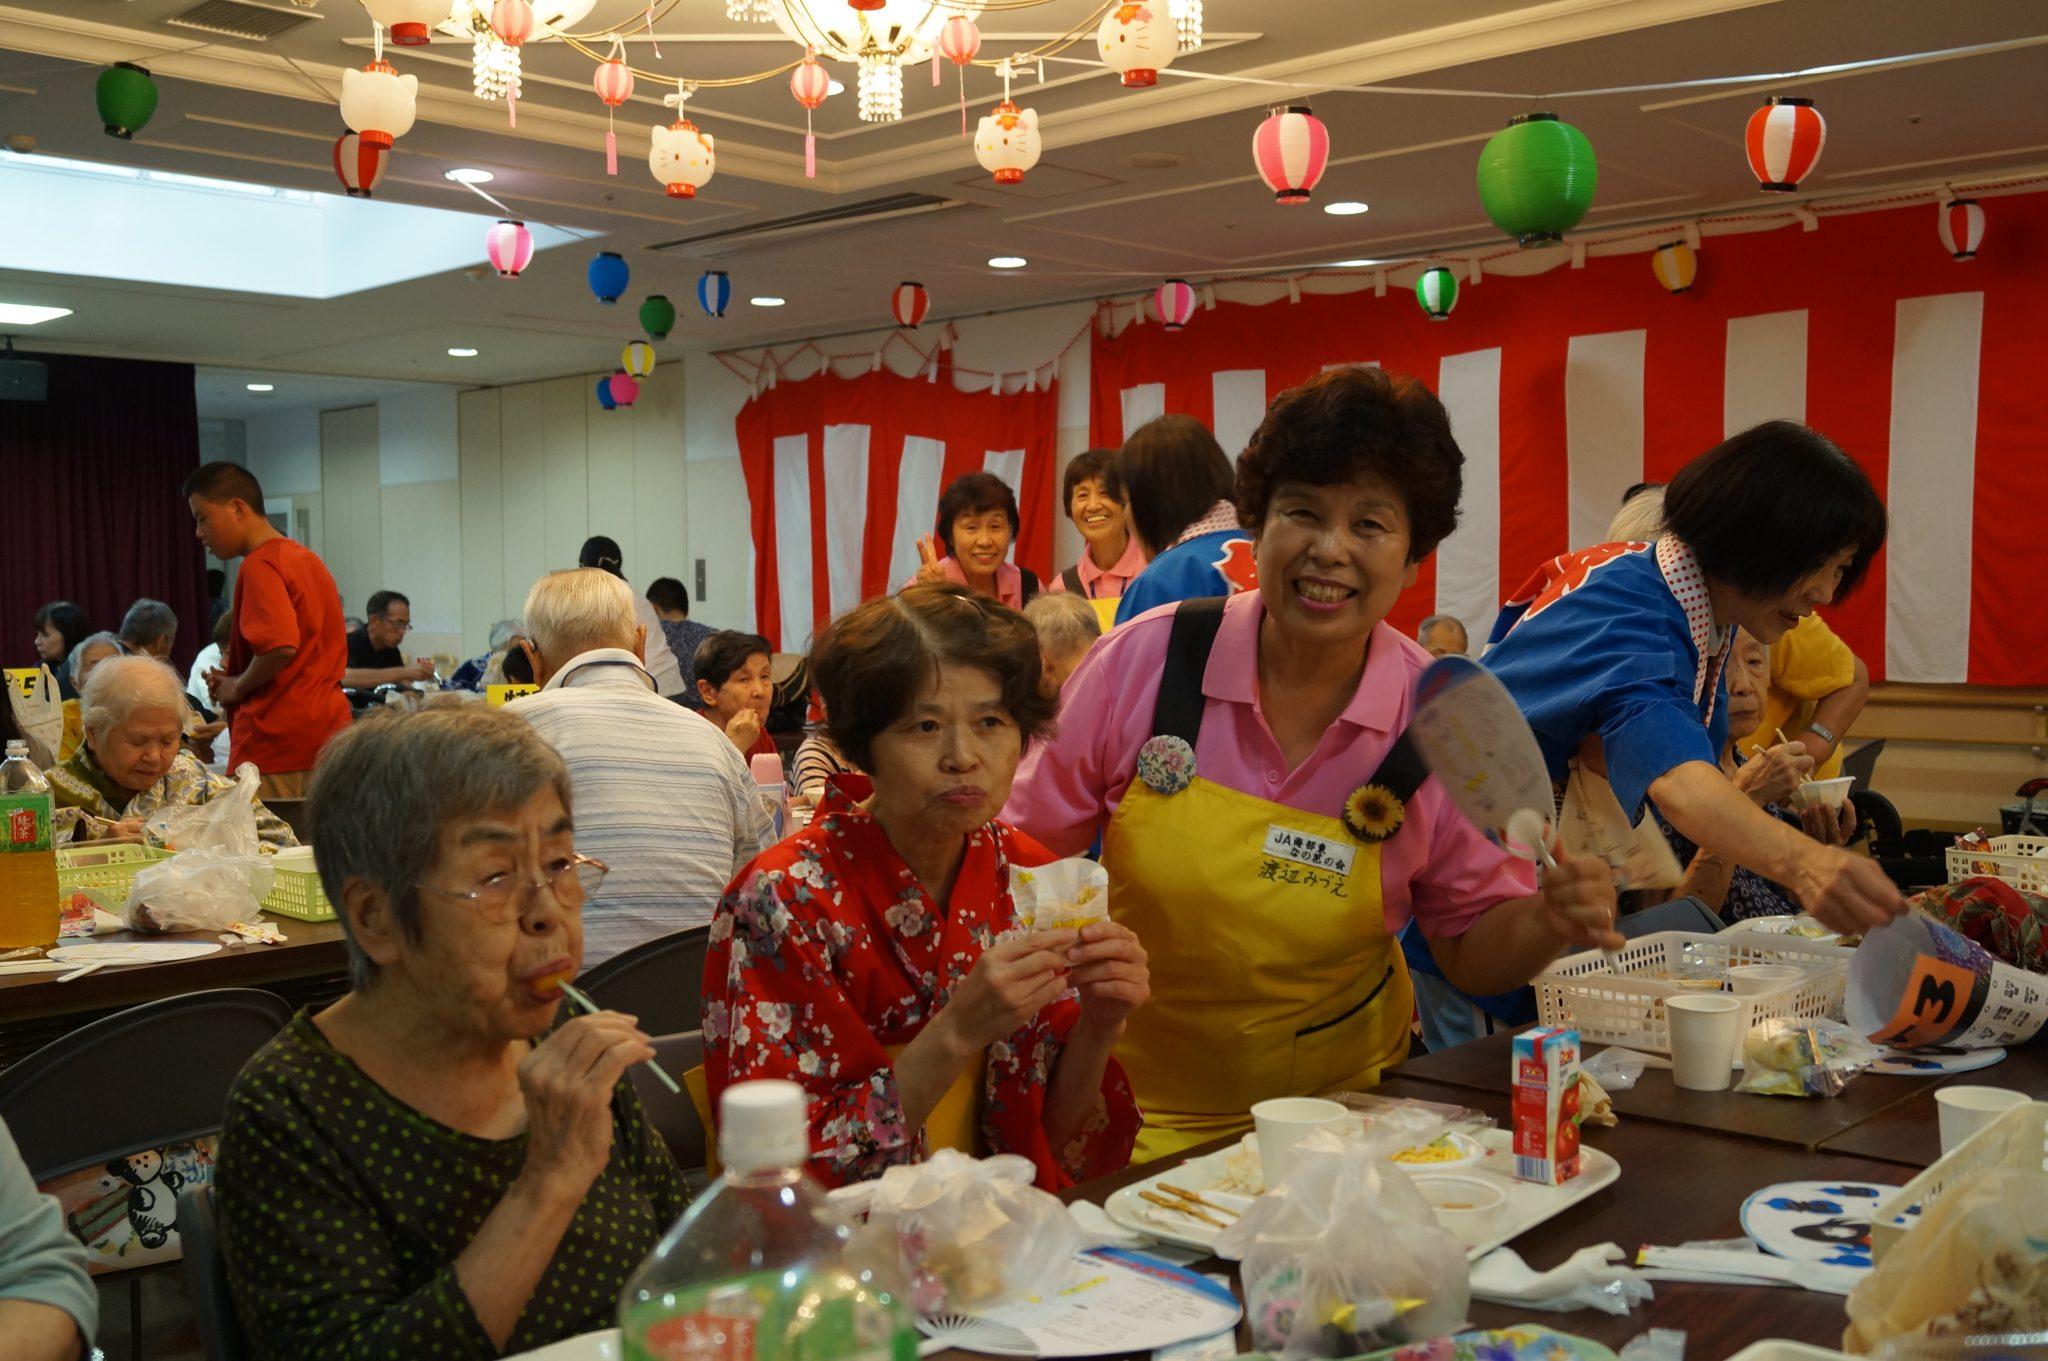 JA 海部東農業協同組合(あまひがし) -なの花の会 夏祭りに協力